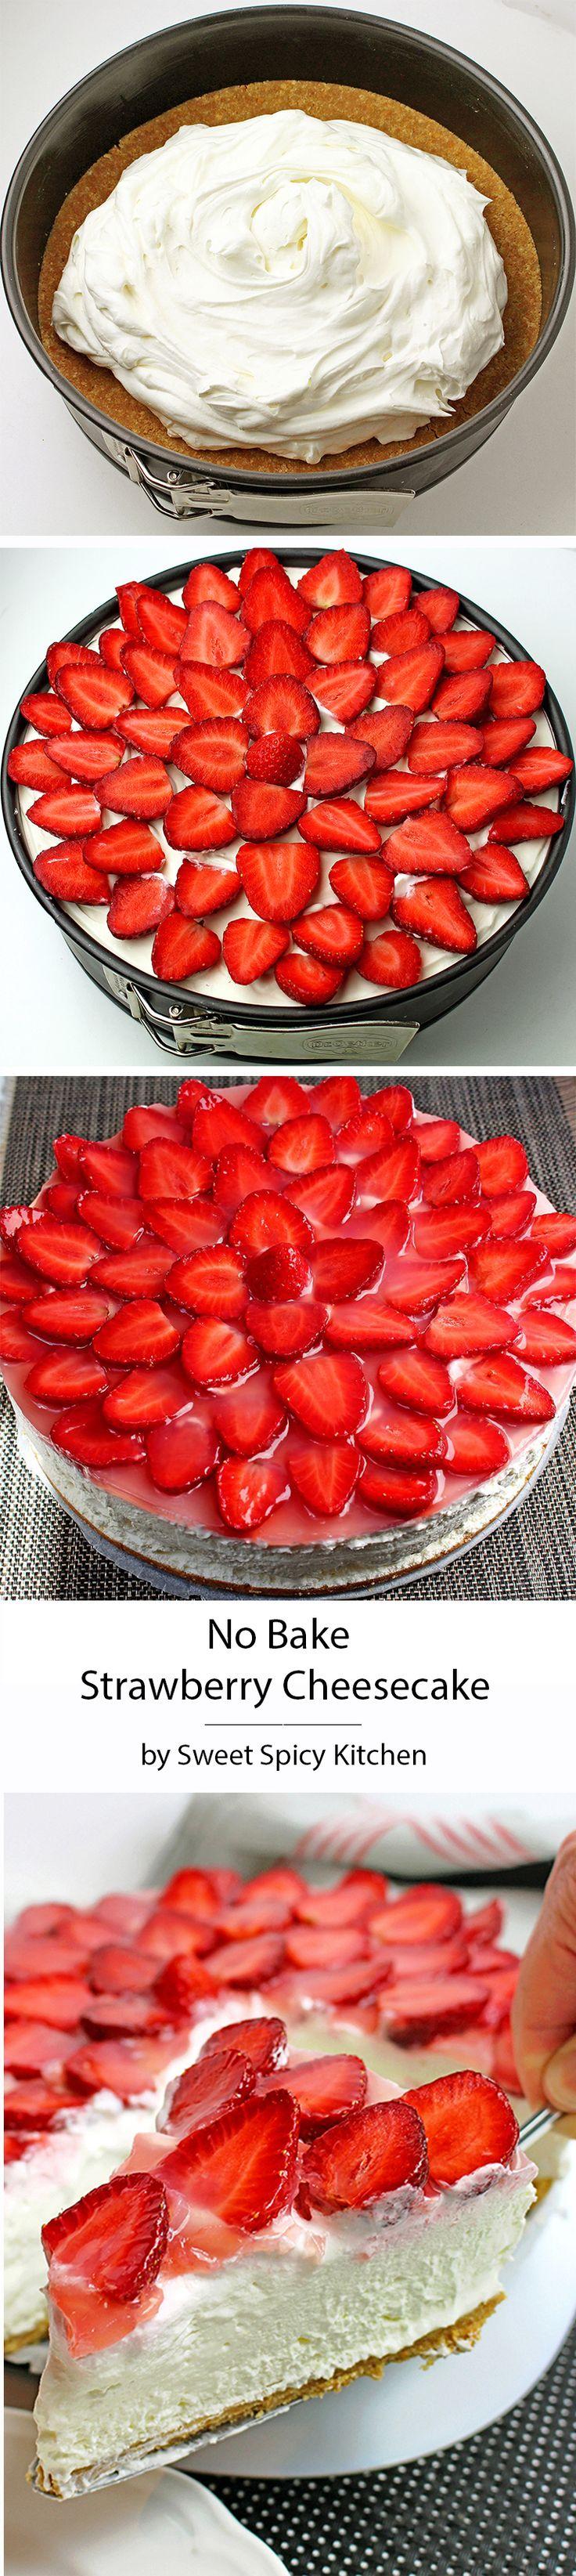 No Bake Strawberry Cheesecake recipe is a perfect homemade dessert rich with cream cheese, graham cracker crust and fresh & juicy strawberries.